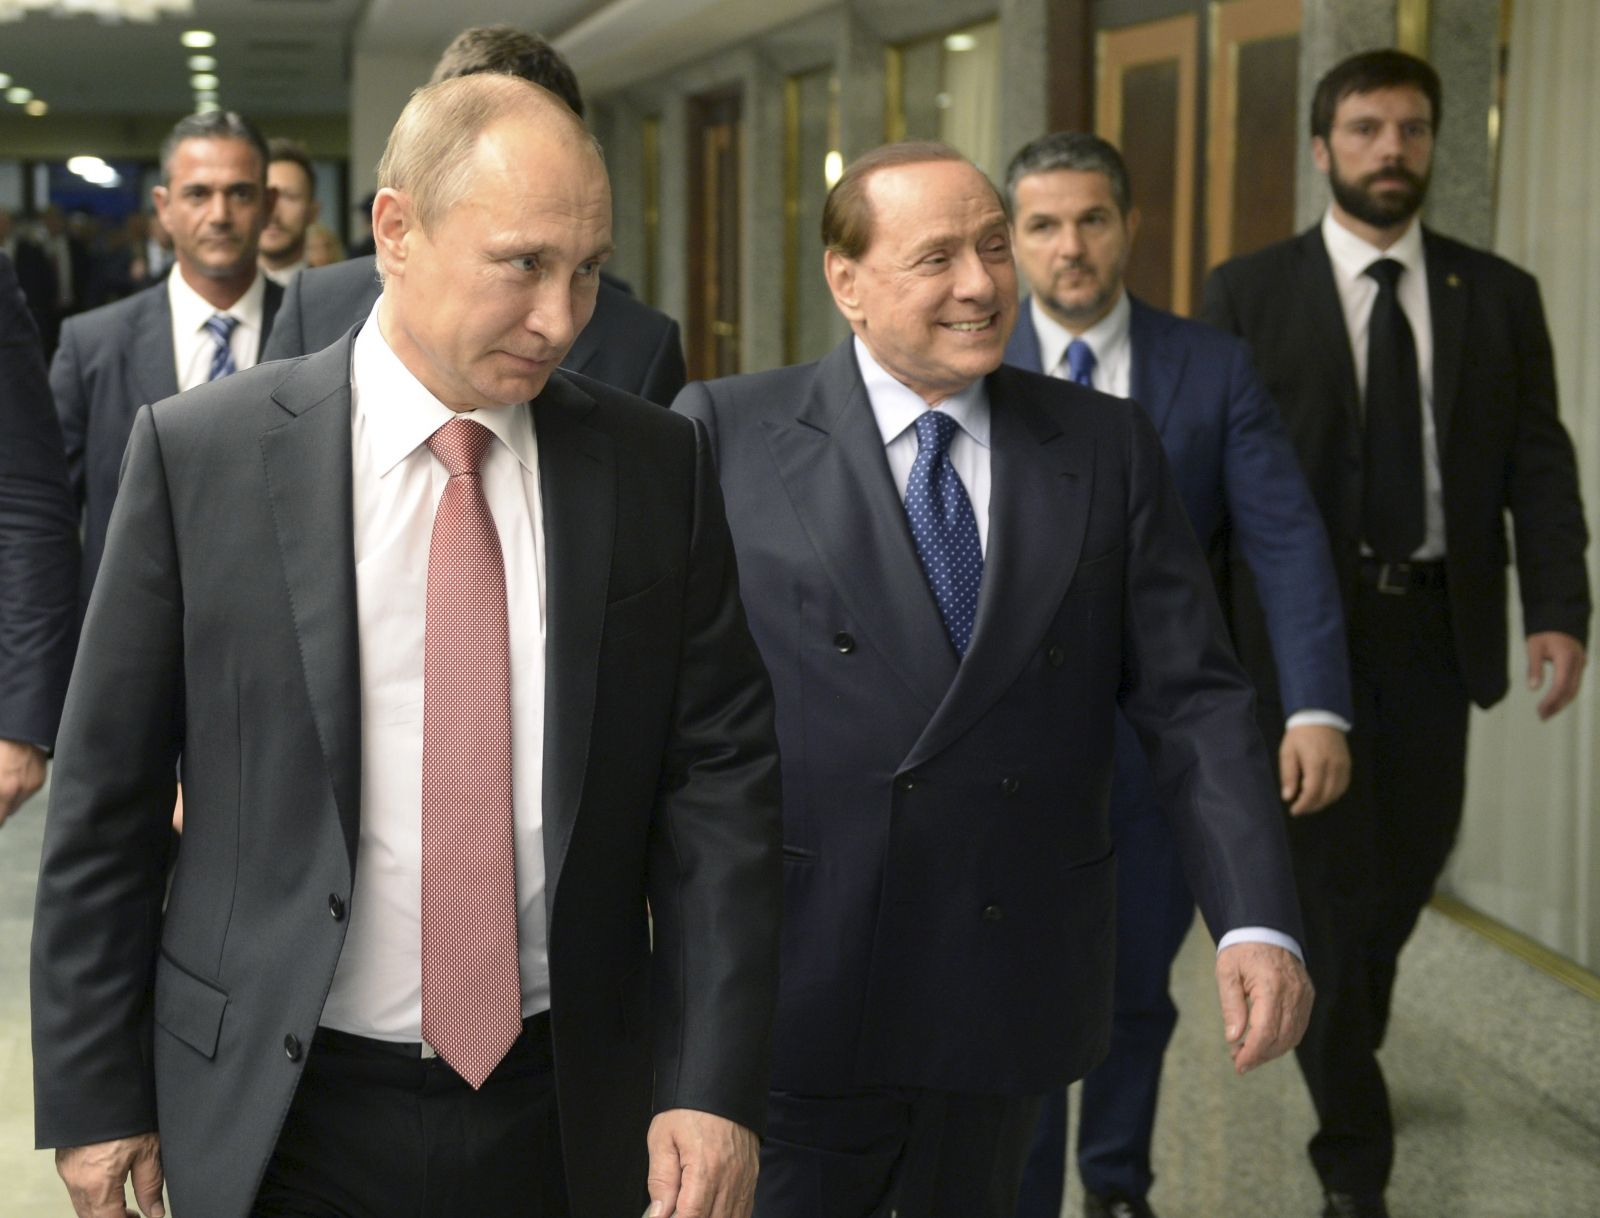 Putin offered Berlusconi job figuratively